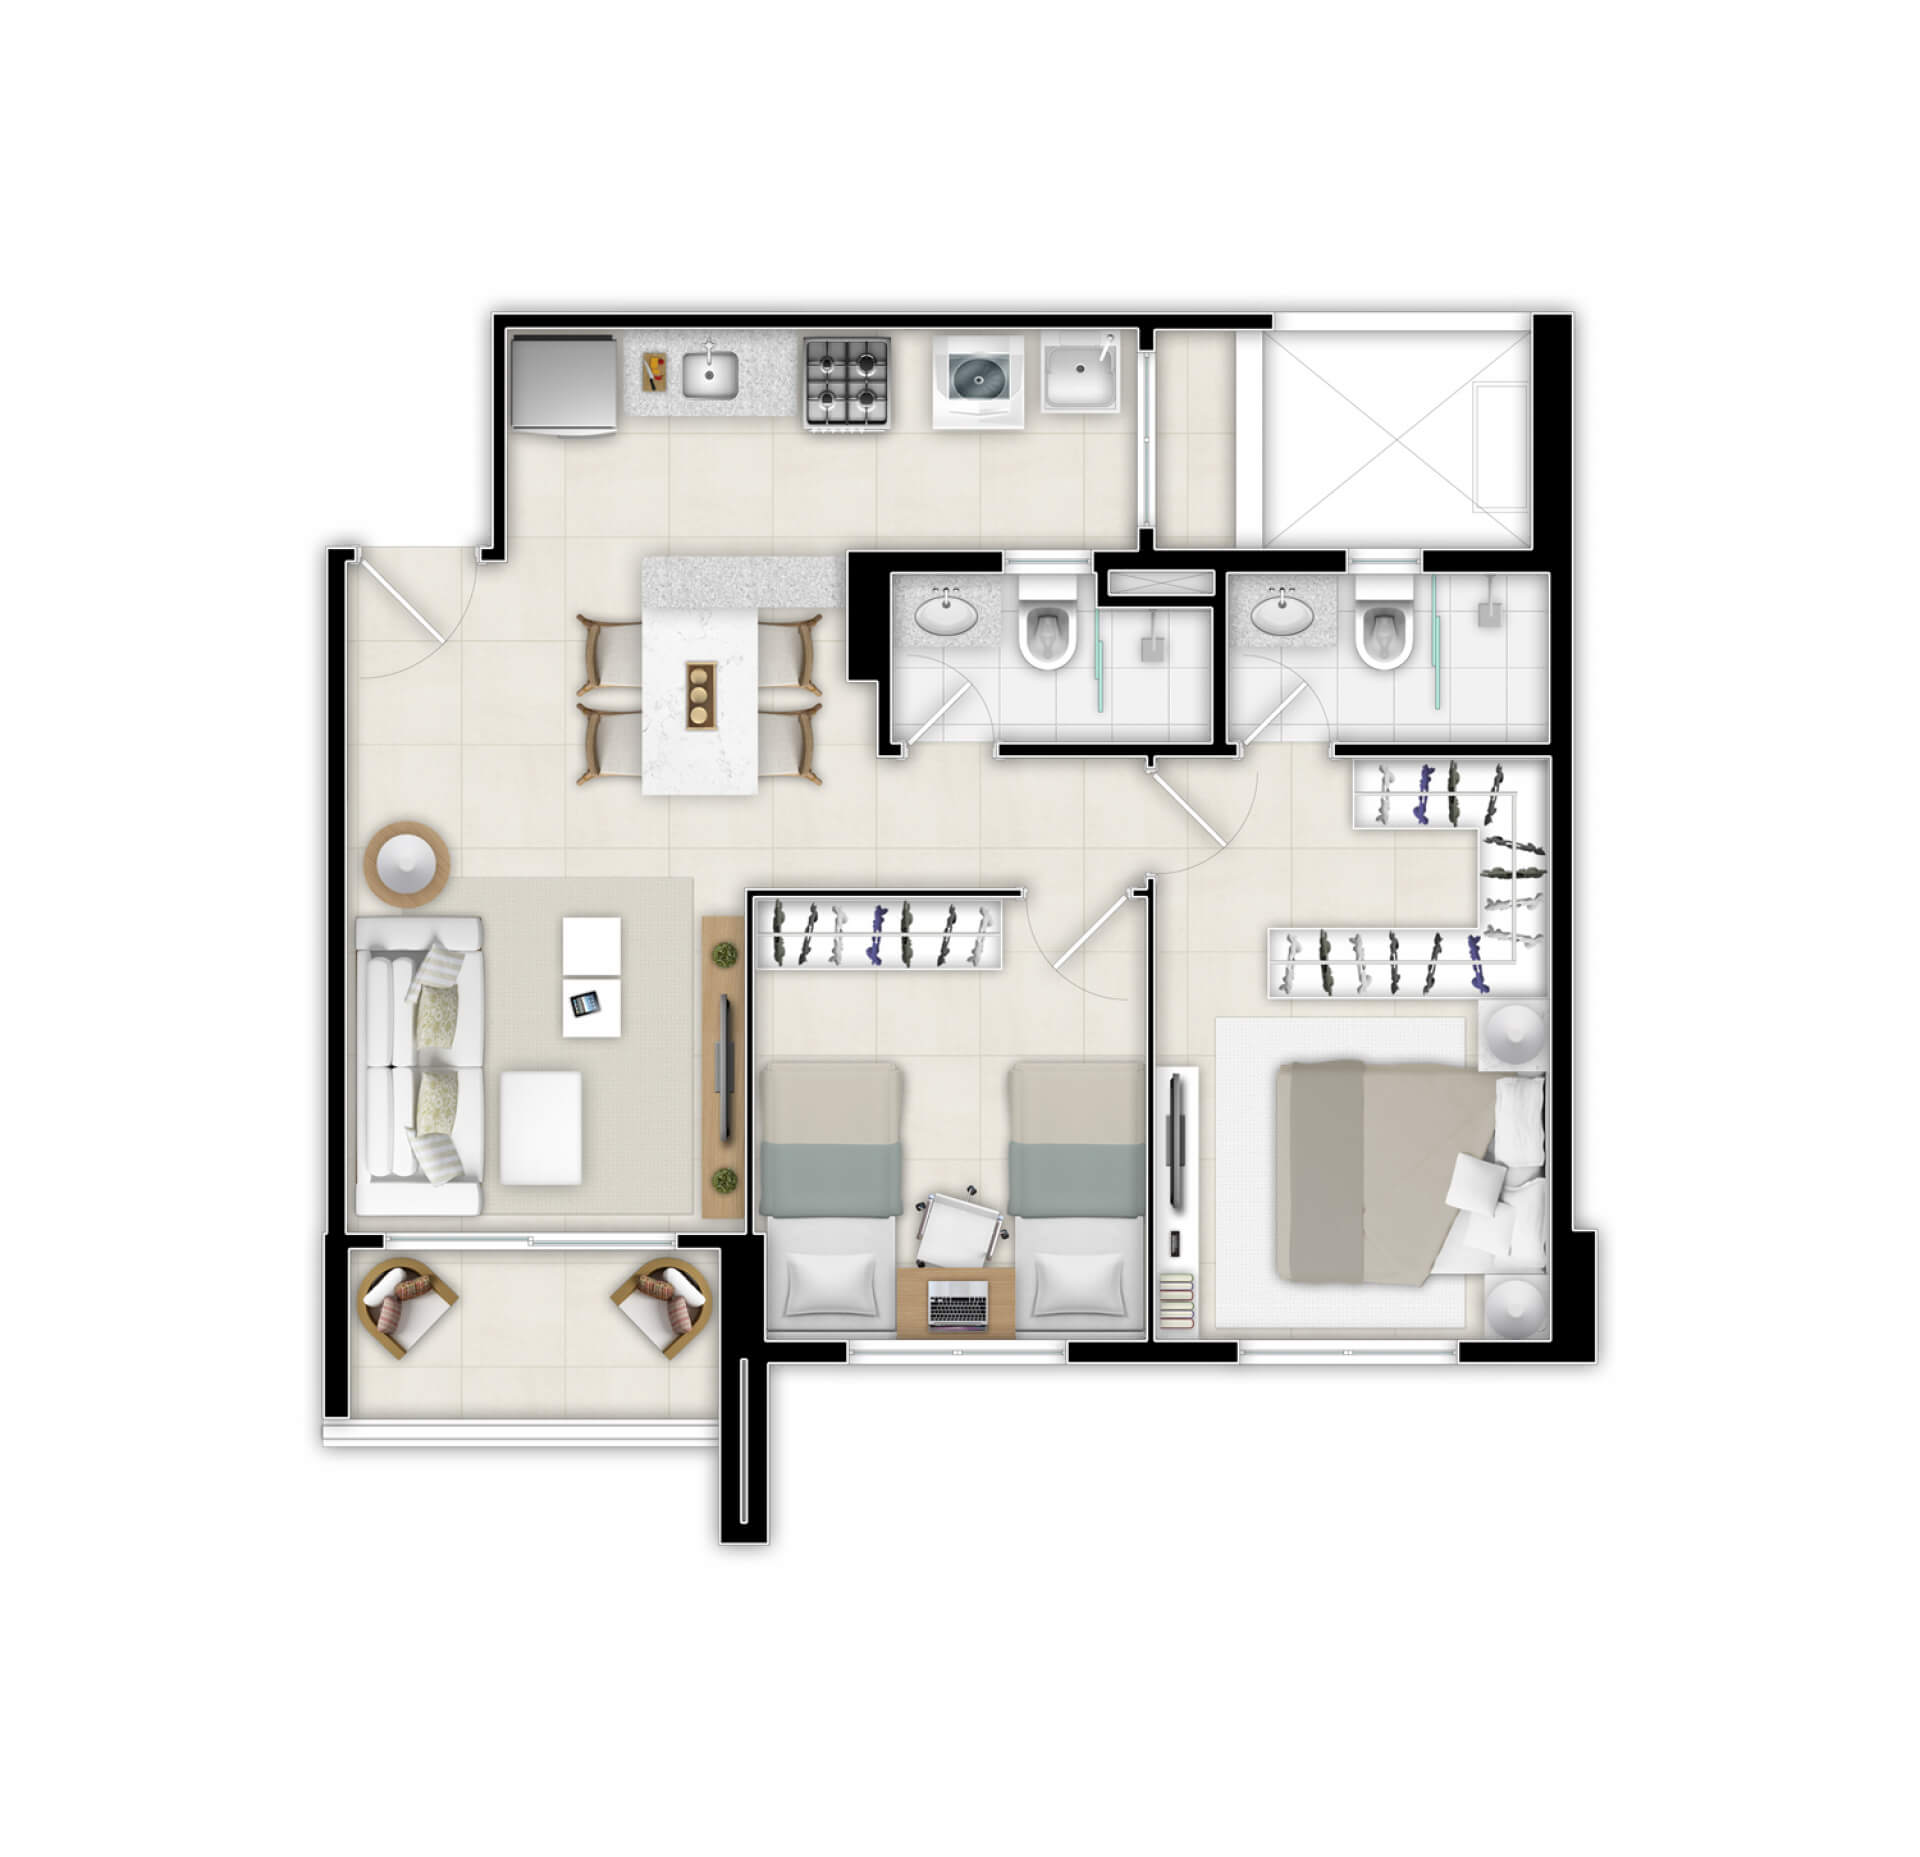 Planta do Duo Residence. floorplan